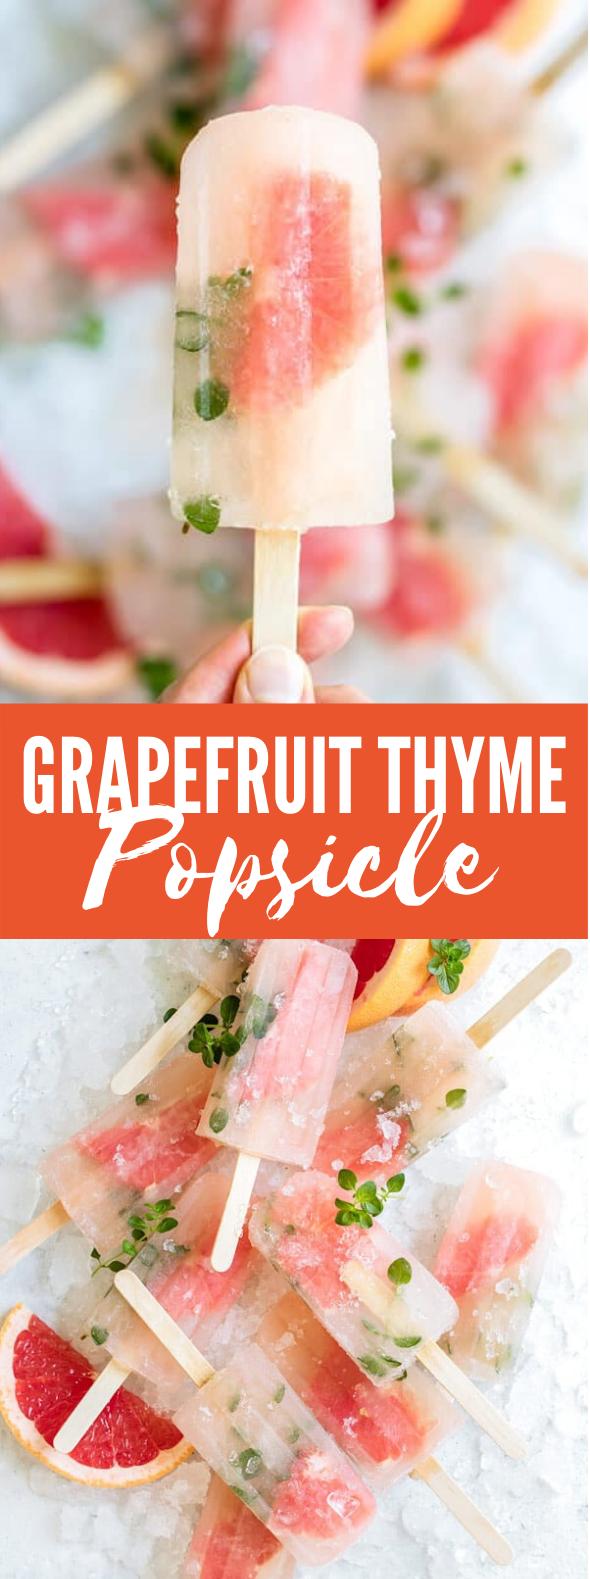 GRAPEFRUIT THYME POPSICLES #desserts #frozenrecipe